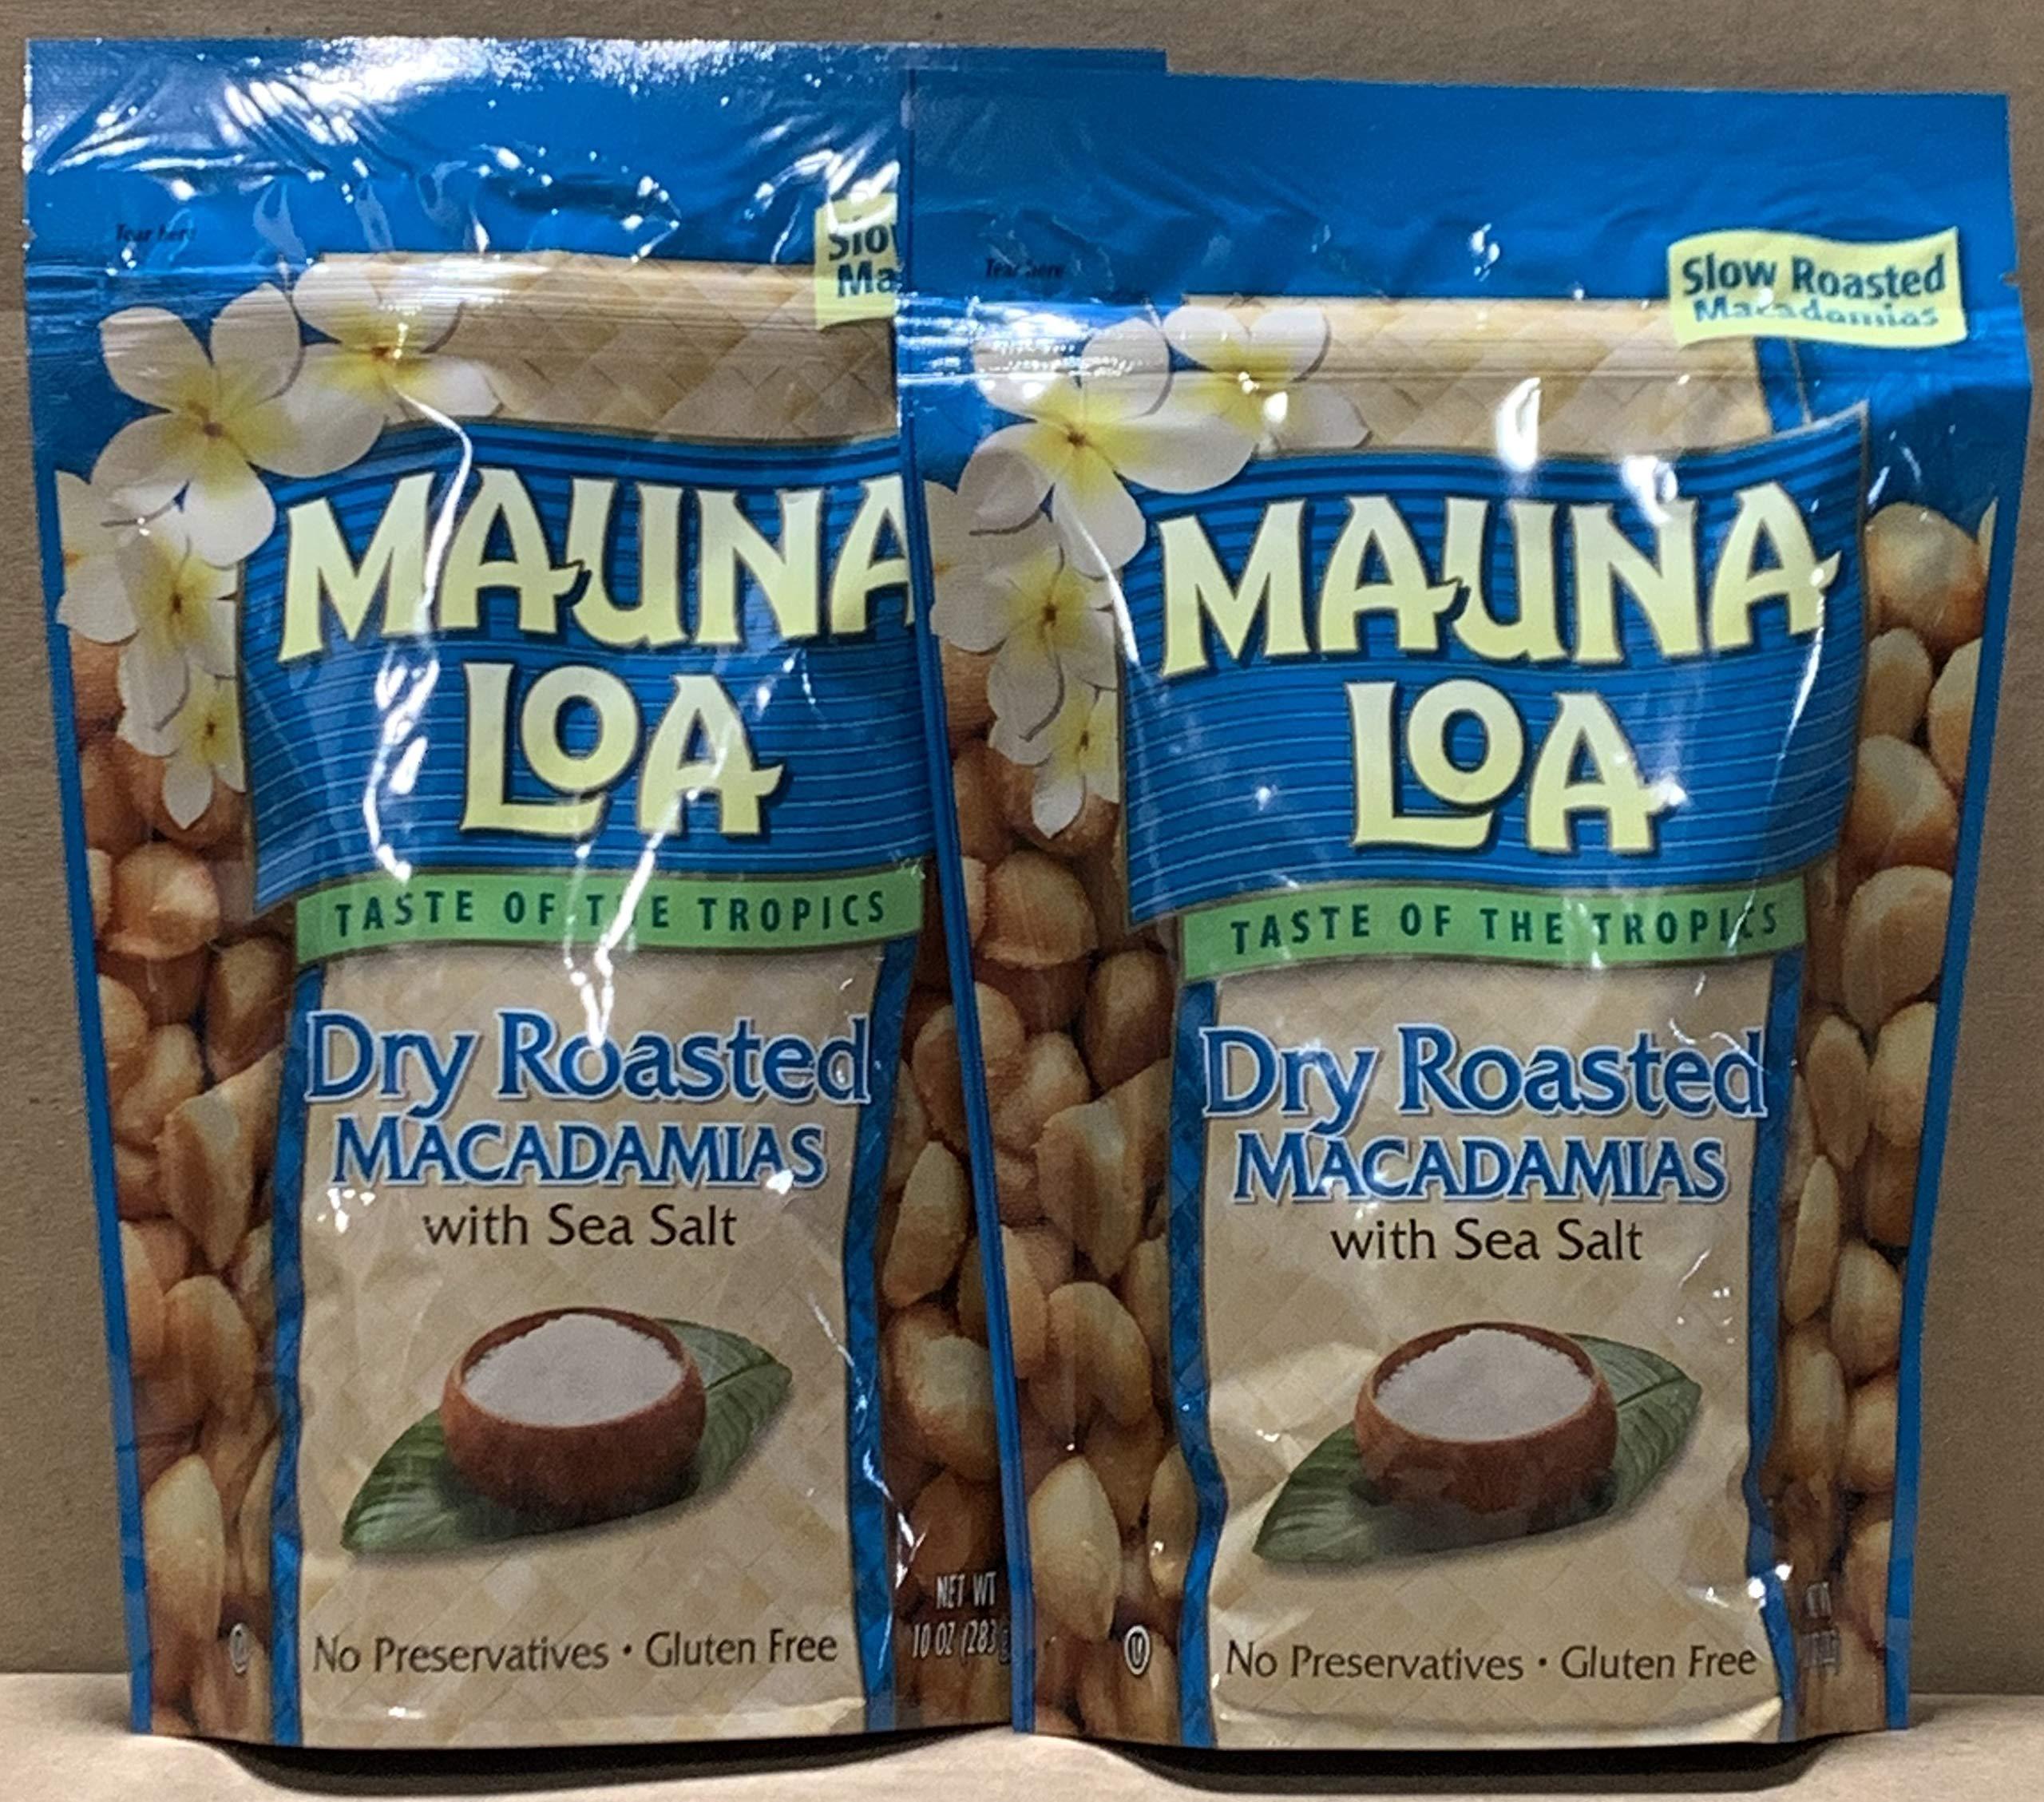 KC Commerce Gift Set Mauna Loa Macadamias, Dry Roasted with Sea Salt, 10-oz (Dry Roasted With Sea Salt 10oz Pack of 2)